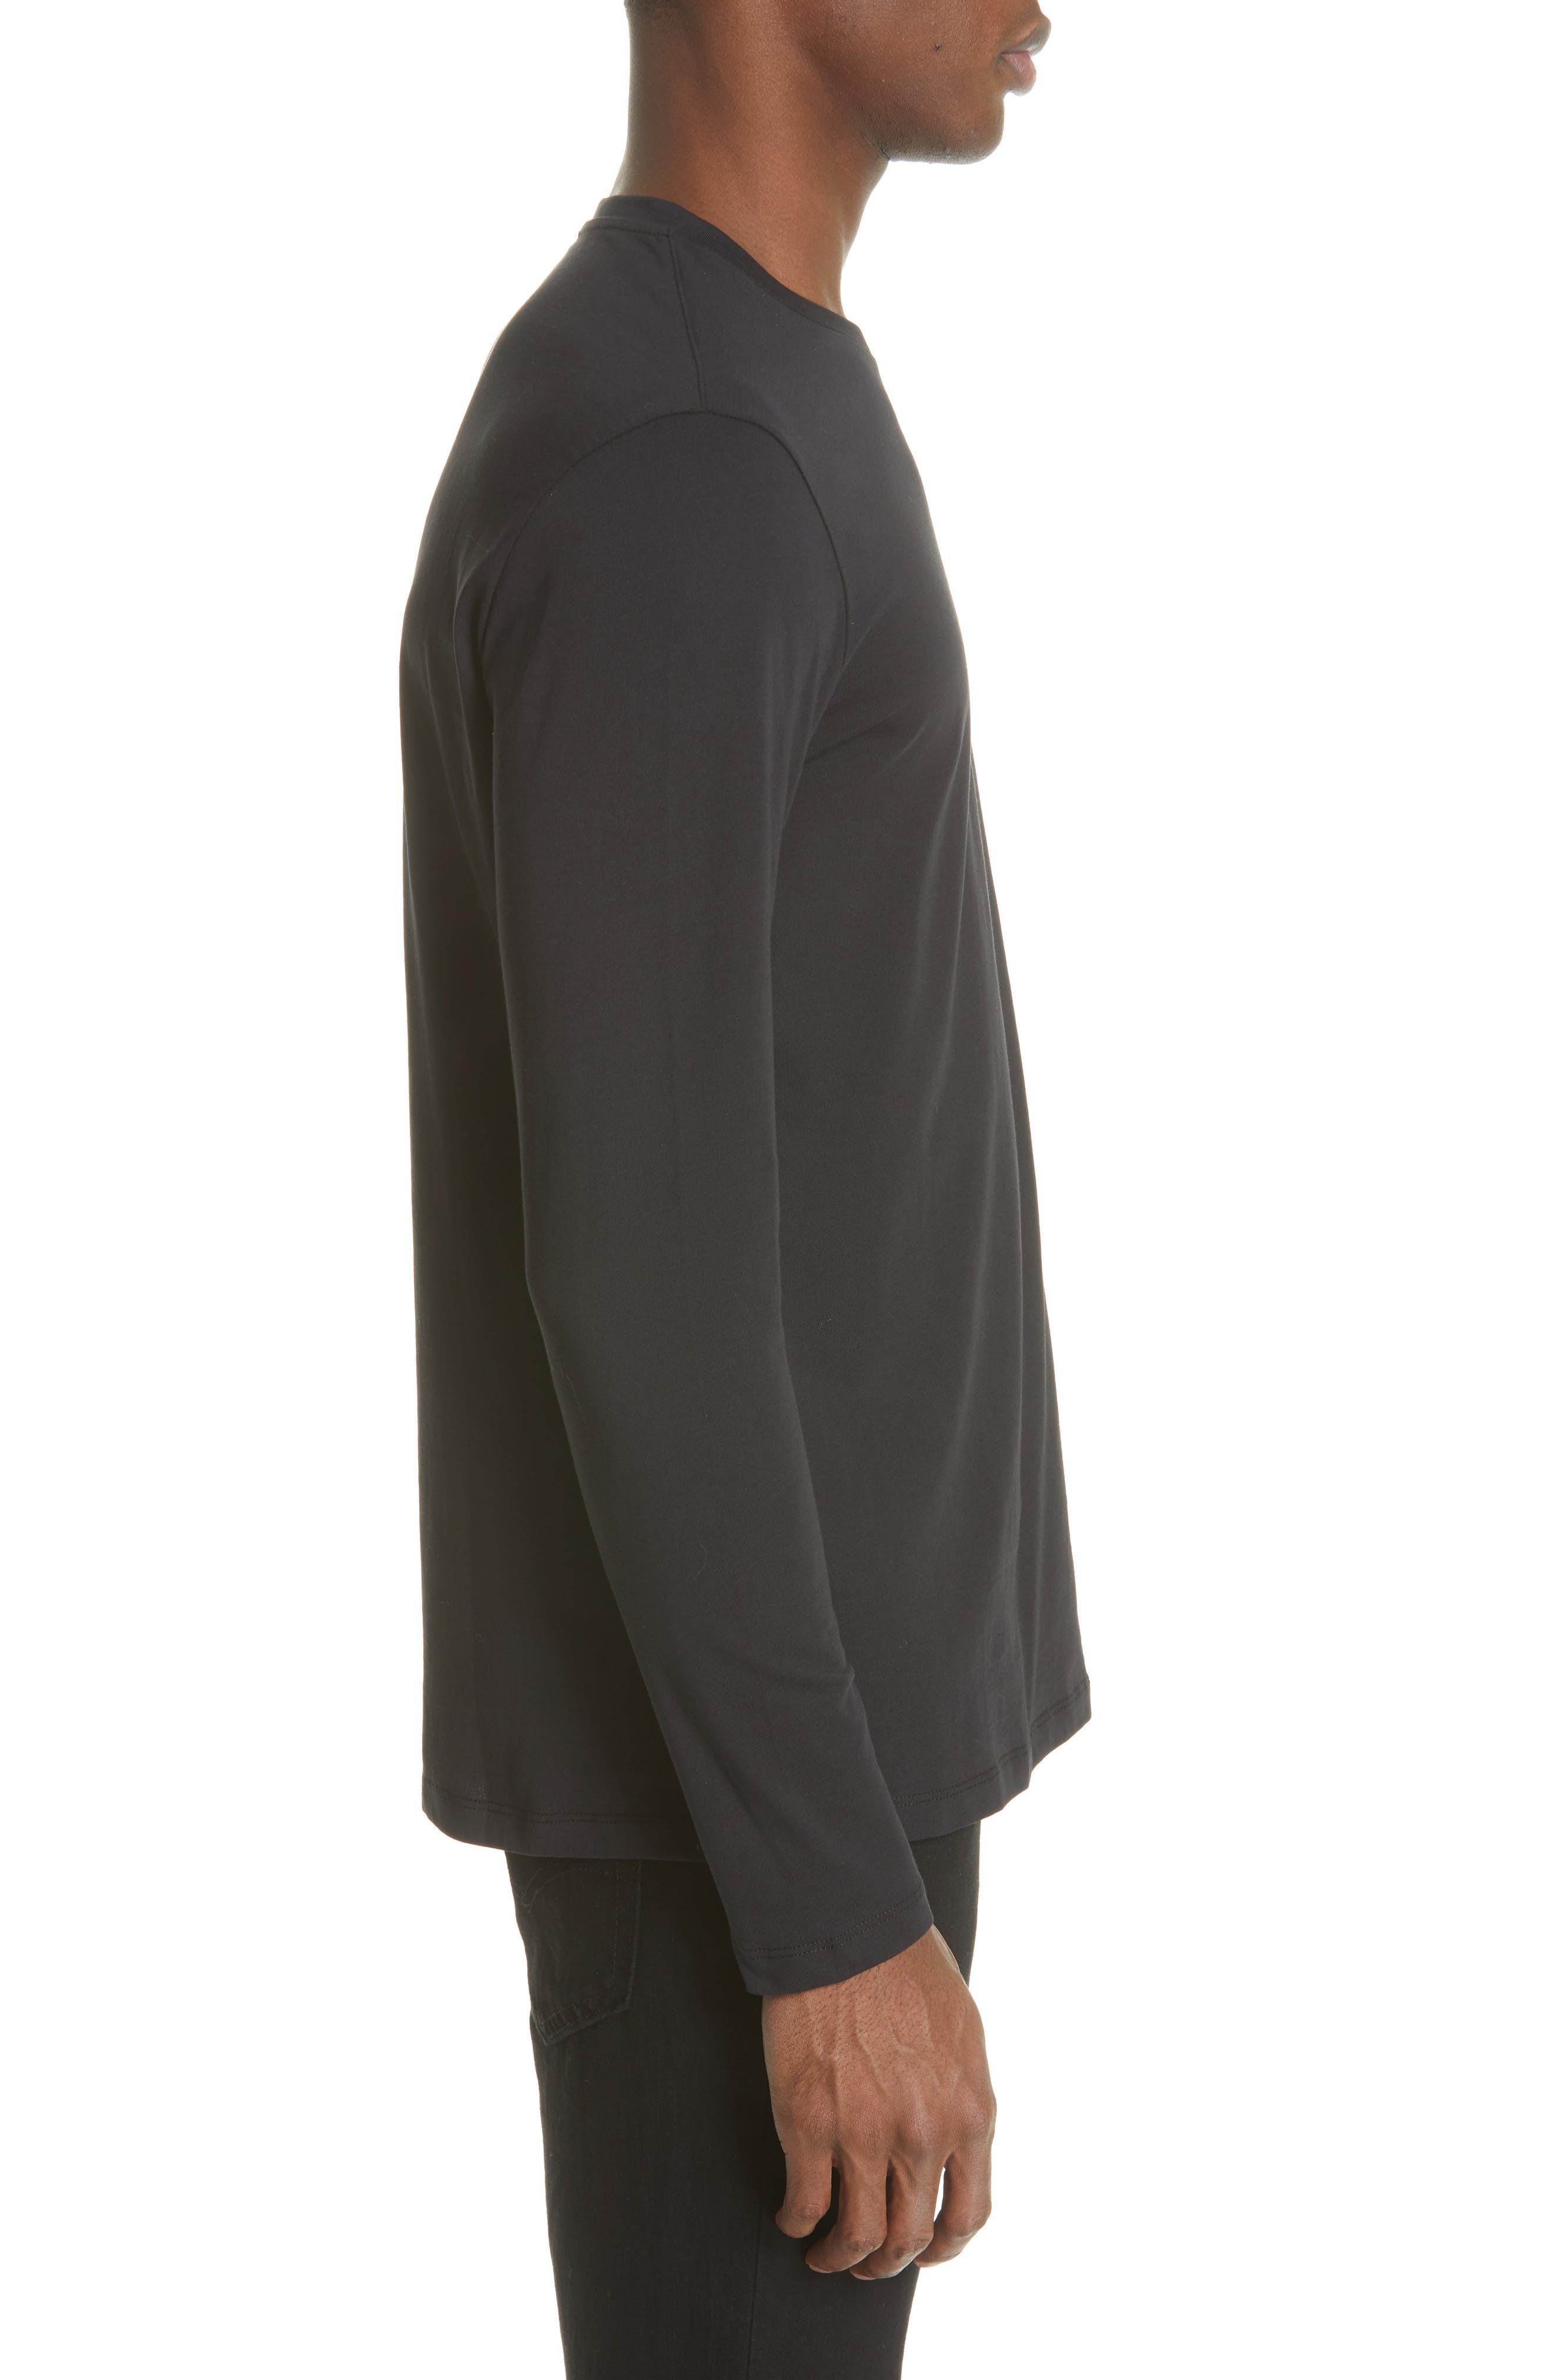 VERSACE COLLECTION, Medusa Long Sleeve T-Shirt, Alternate thumbnail 3, color, 001